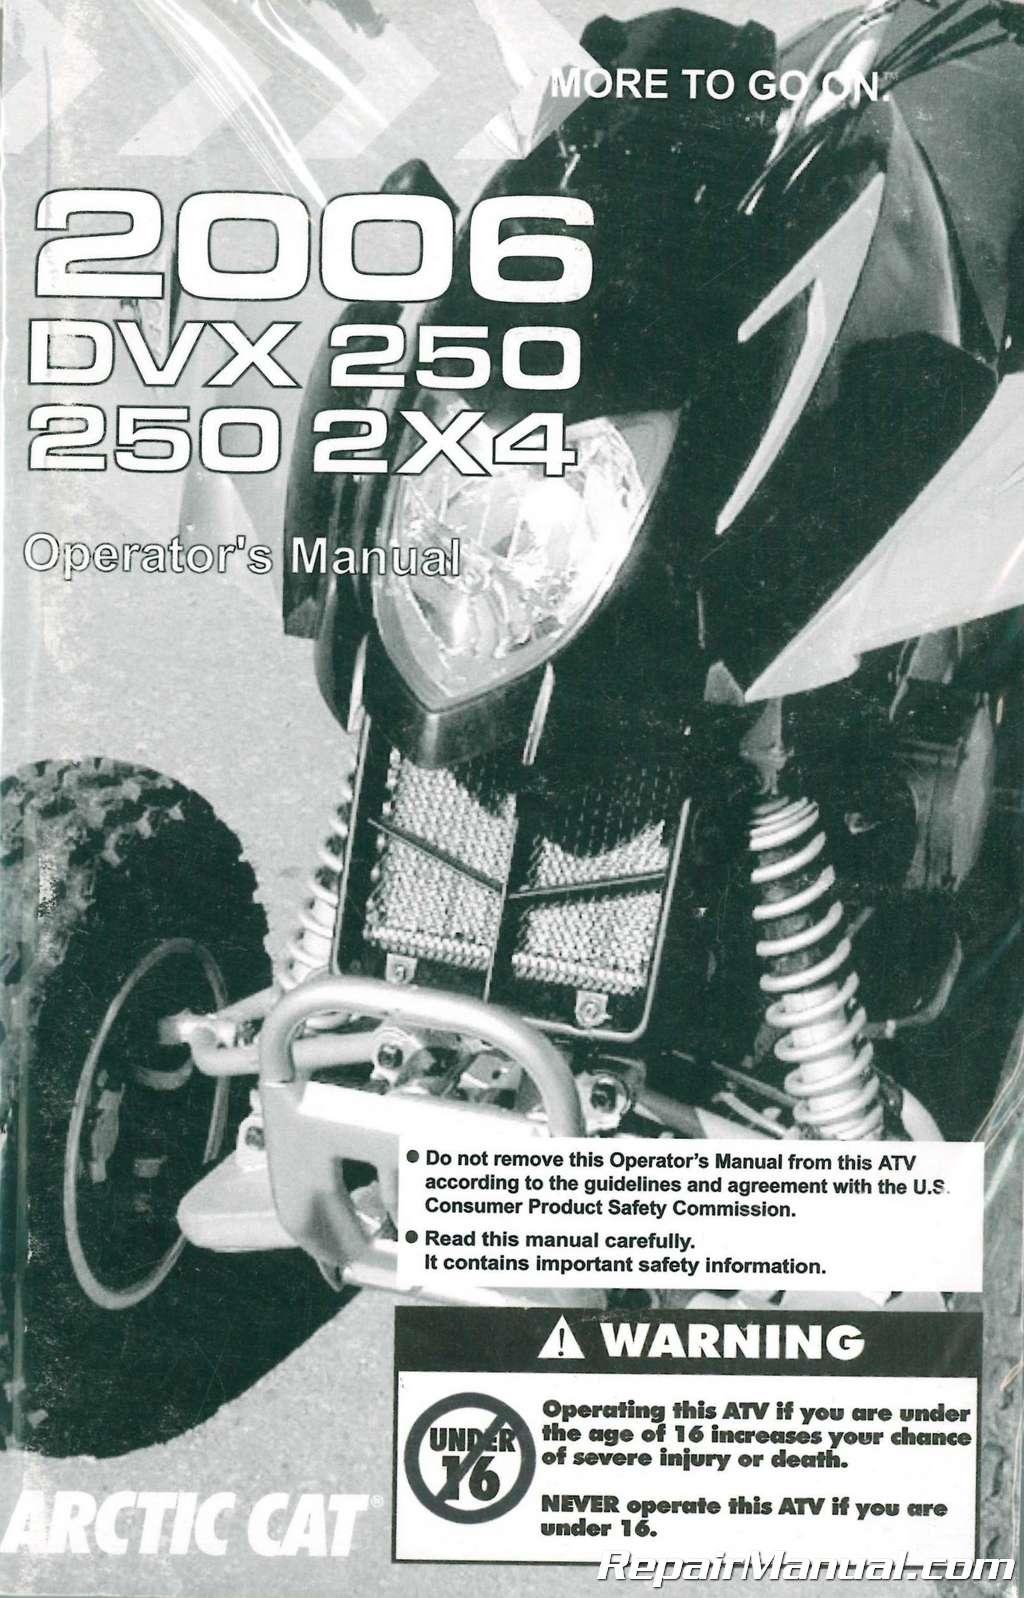 2006 Arctic Cat 250 Dvx Utility Atv Owners Manual